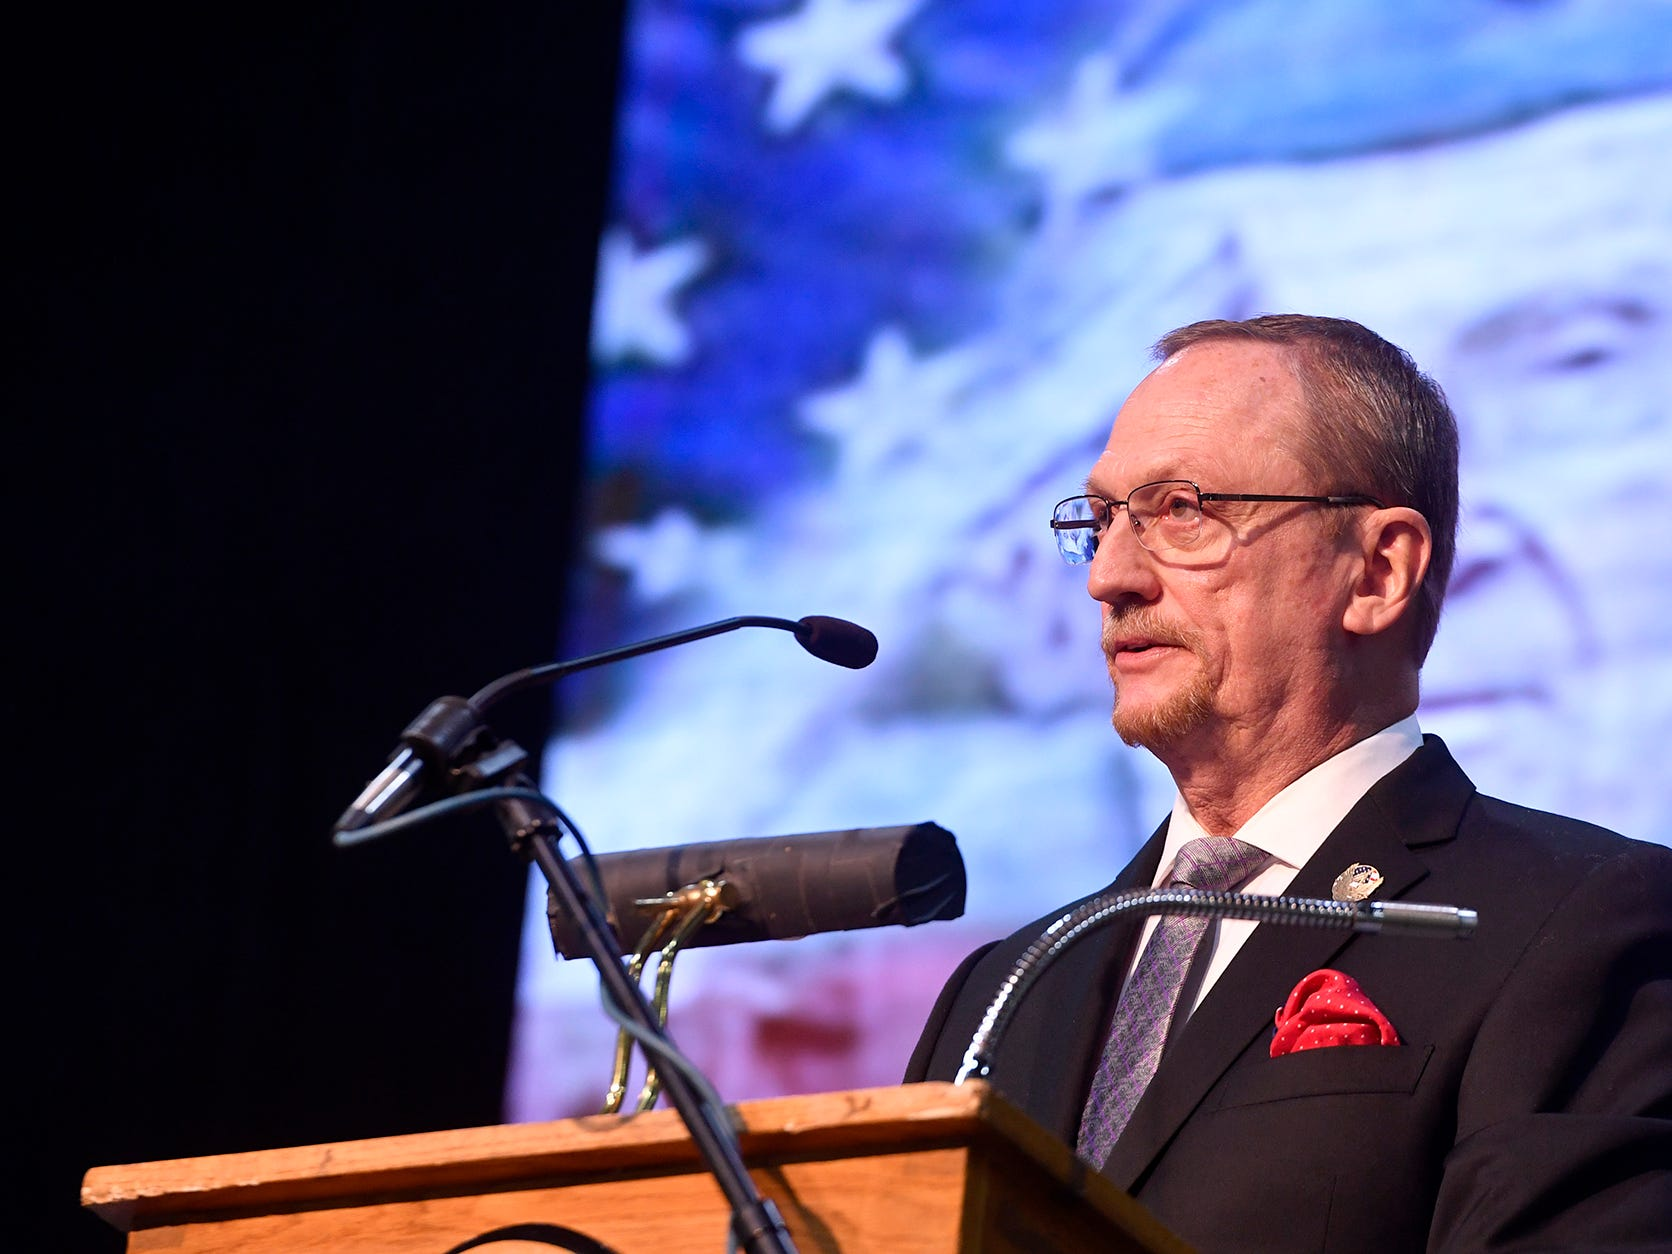 2018 York County Veterans Day Celebration, Sunday, November 11, 2018. John A. Pavoncello photo